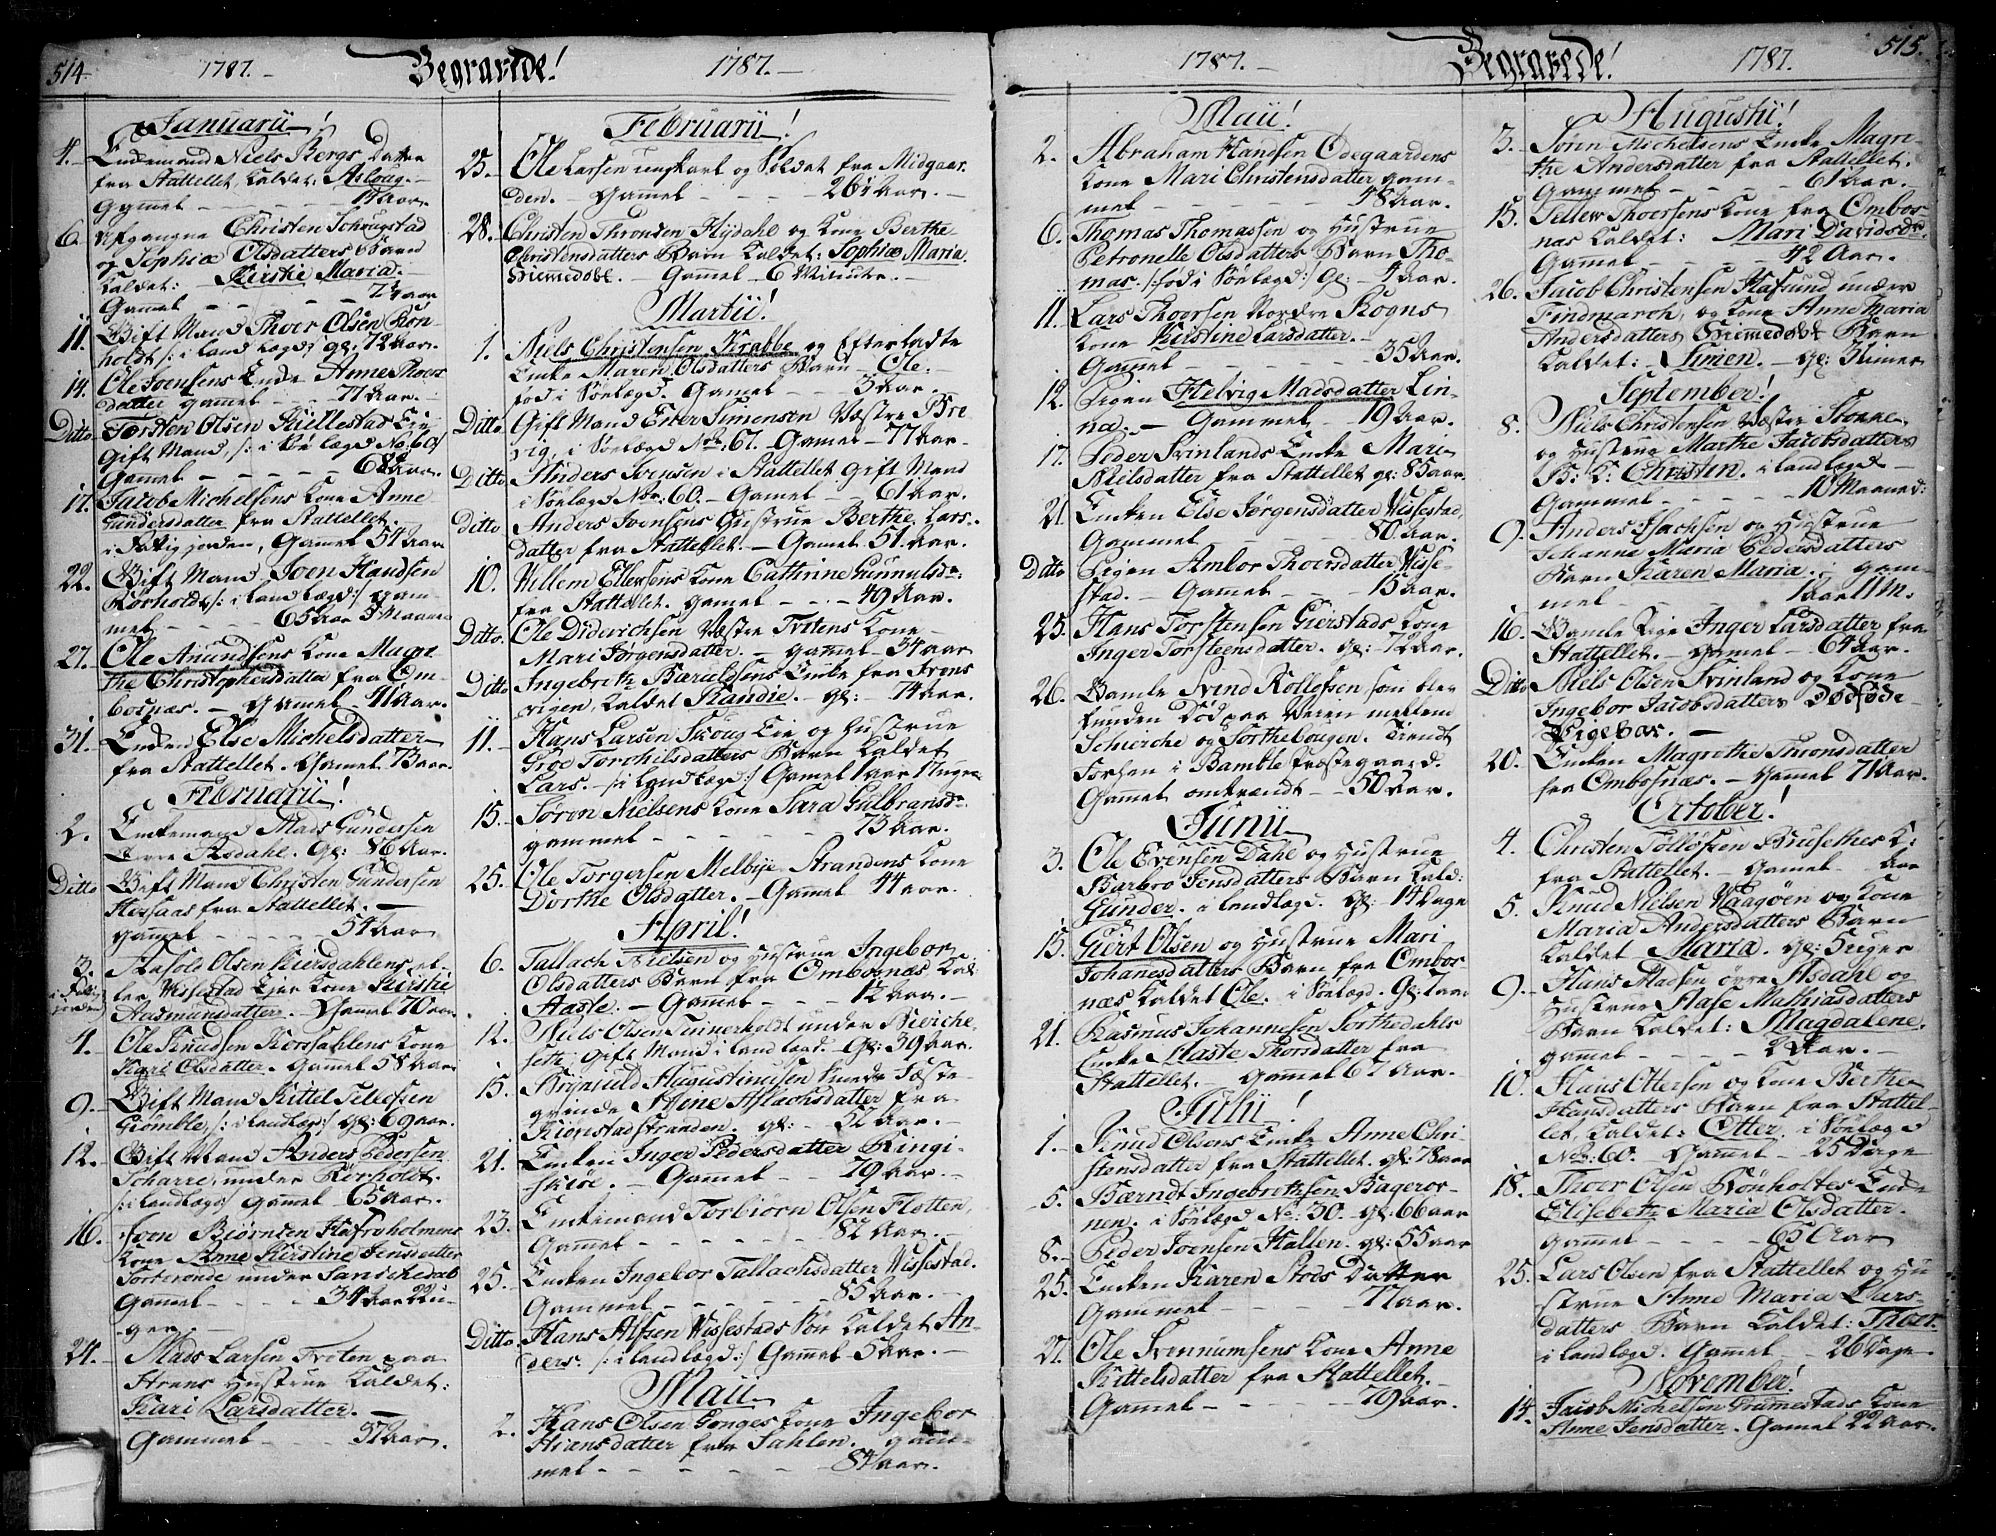 SAKO, Bamble kirkebøker, F/Fa/L0002: Ministerialbok nr. I 2, 1775-1814, s. 514-515